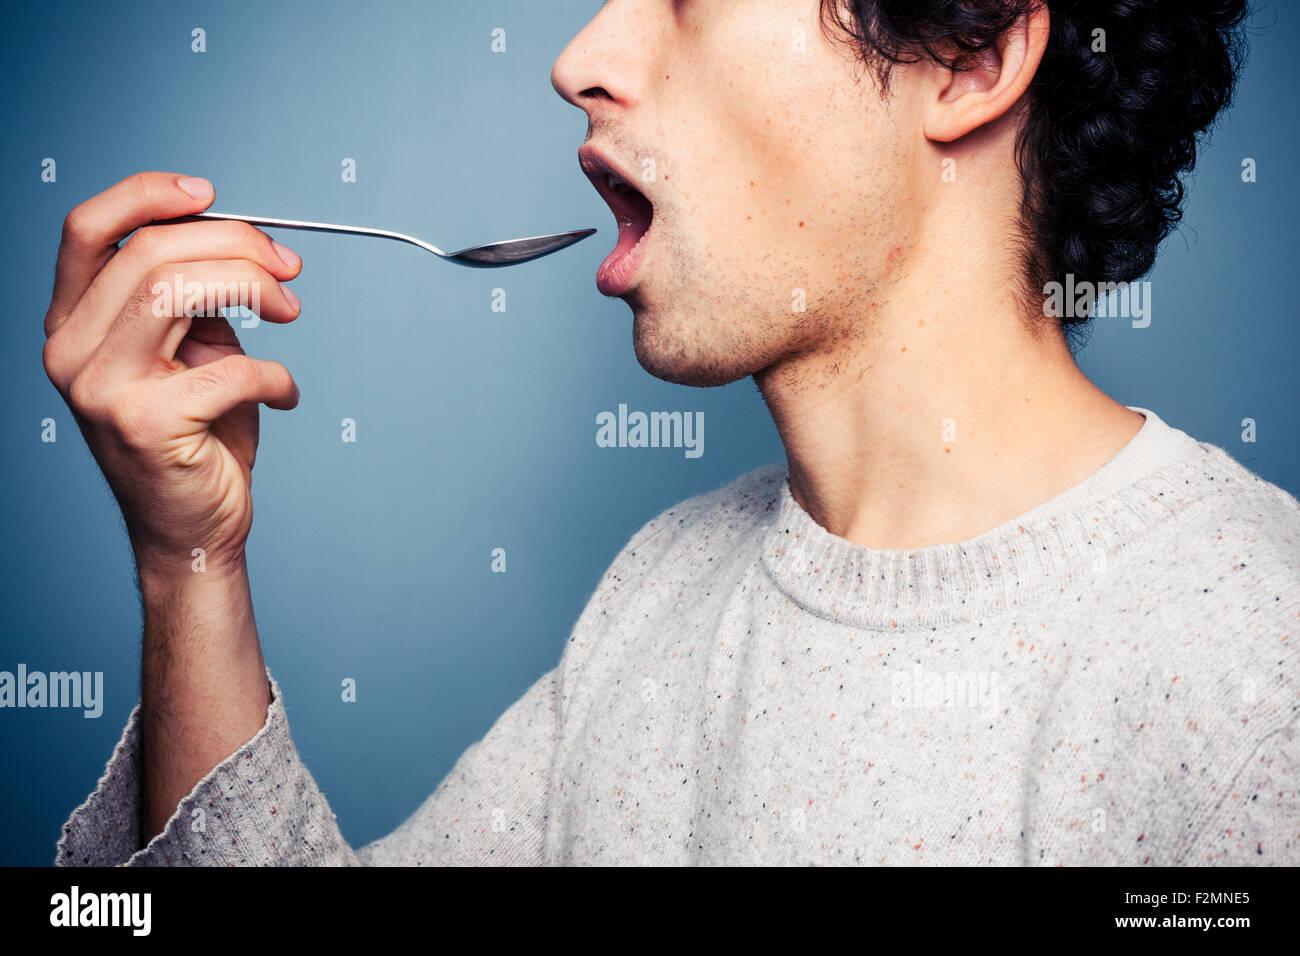 Junger Mann er Löffel in den Mund Stockbild